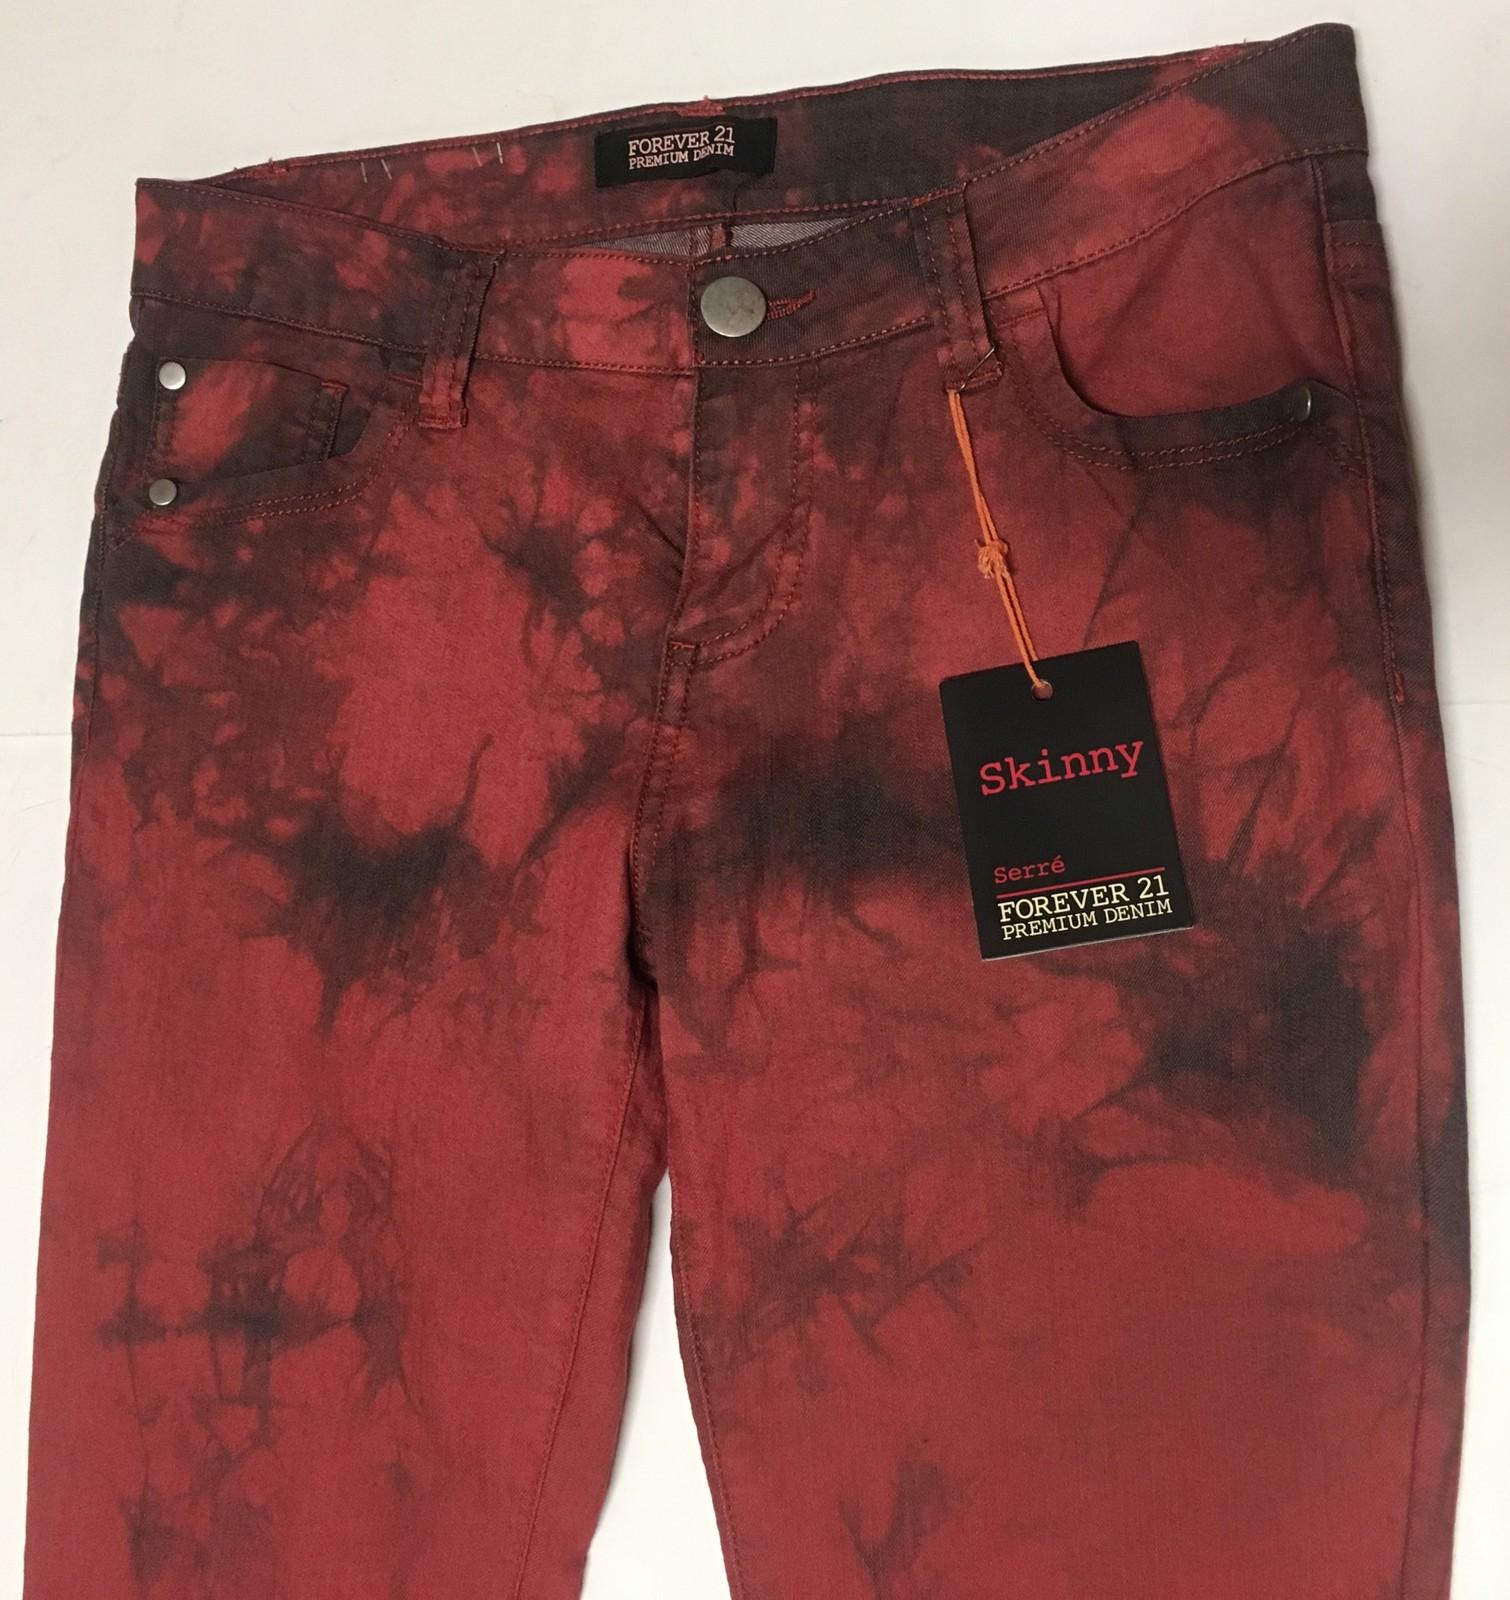 Forever 21 Denim Skinny Jeans Sz 27 x 31 Red & Black Tie Dyed  image 3